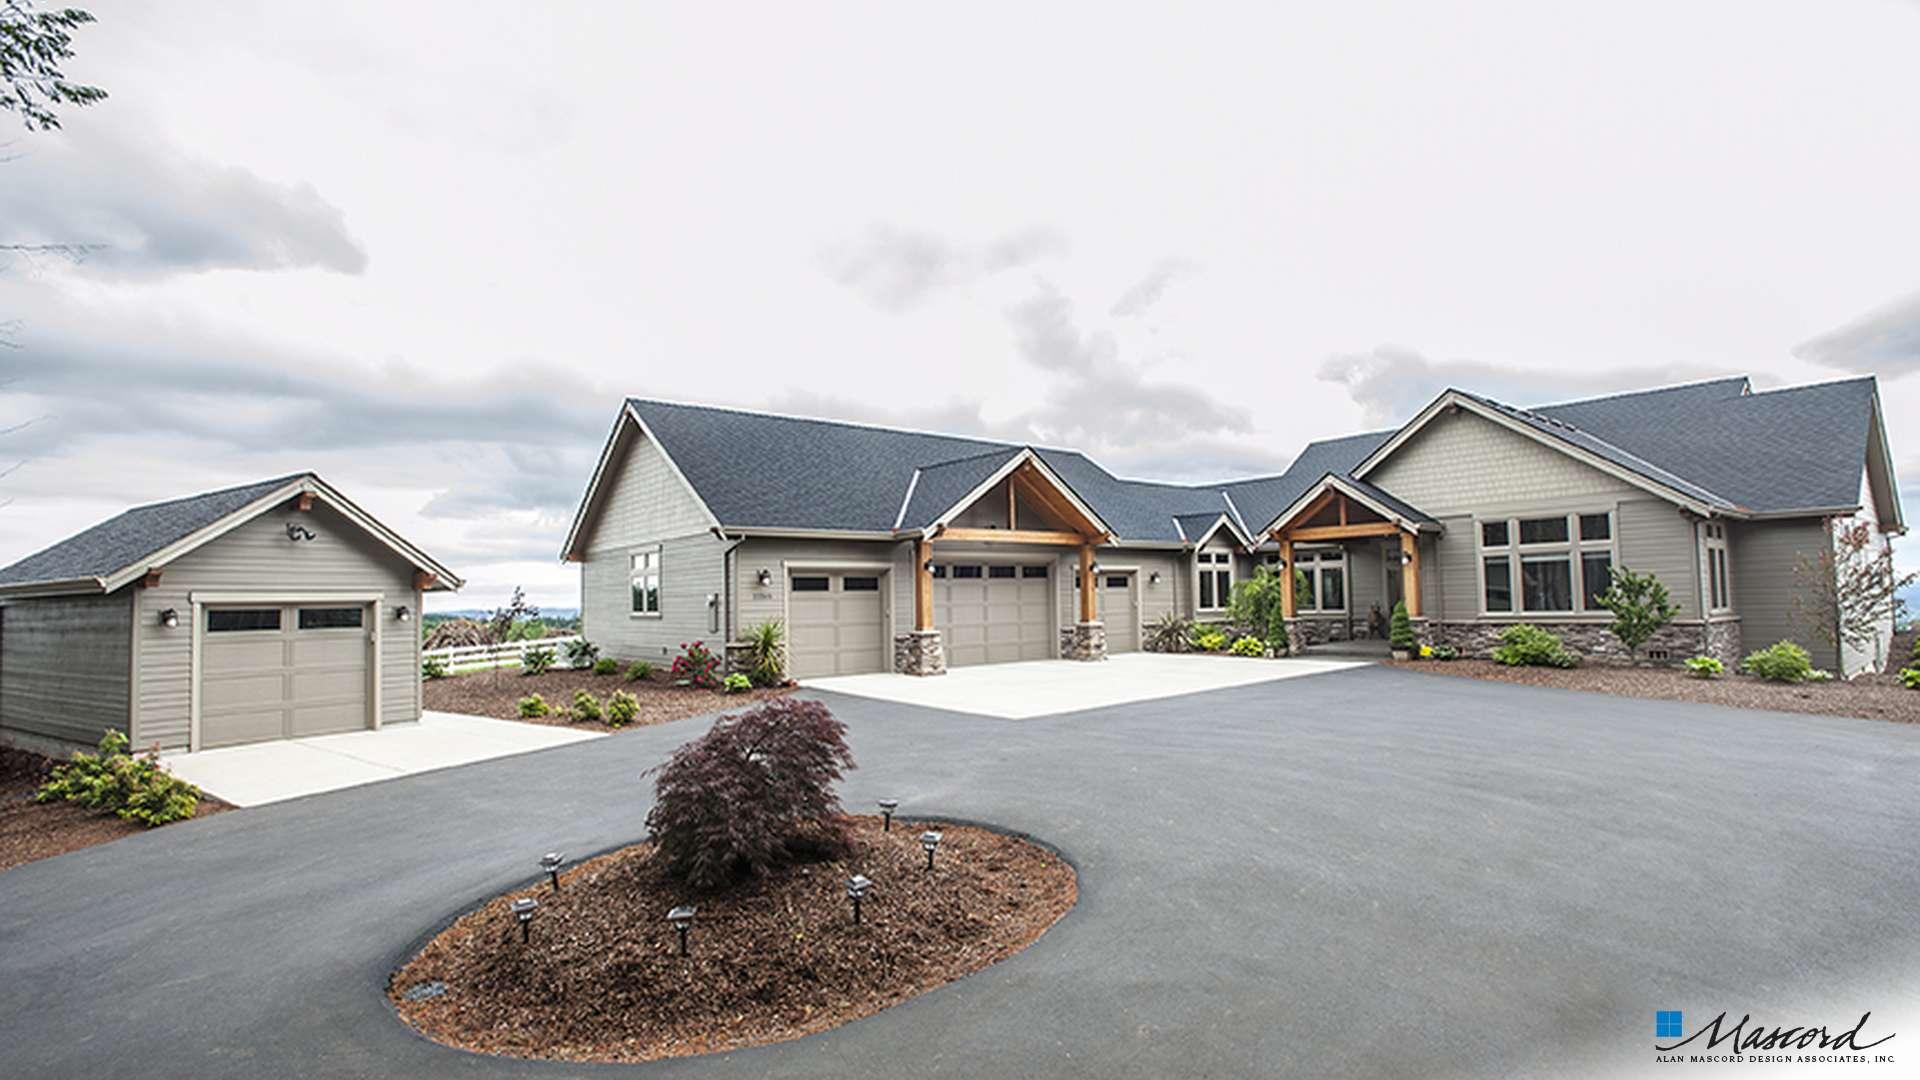 Craftsman House Plan 1235 The Broderick: 2999 Sqft, 4 Bedrooms, 2.1 ...